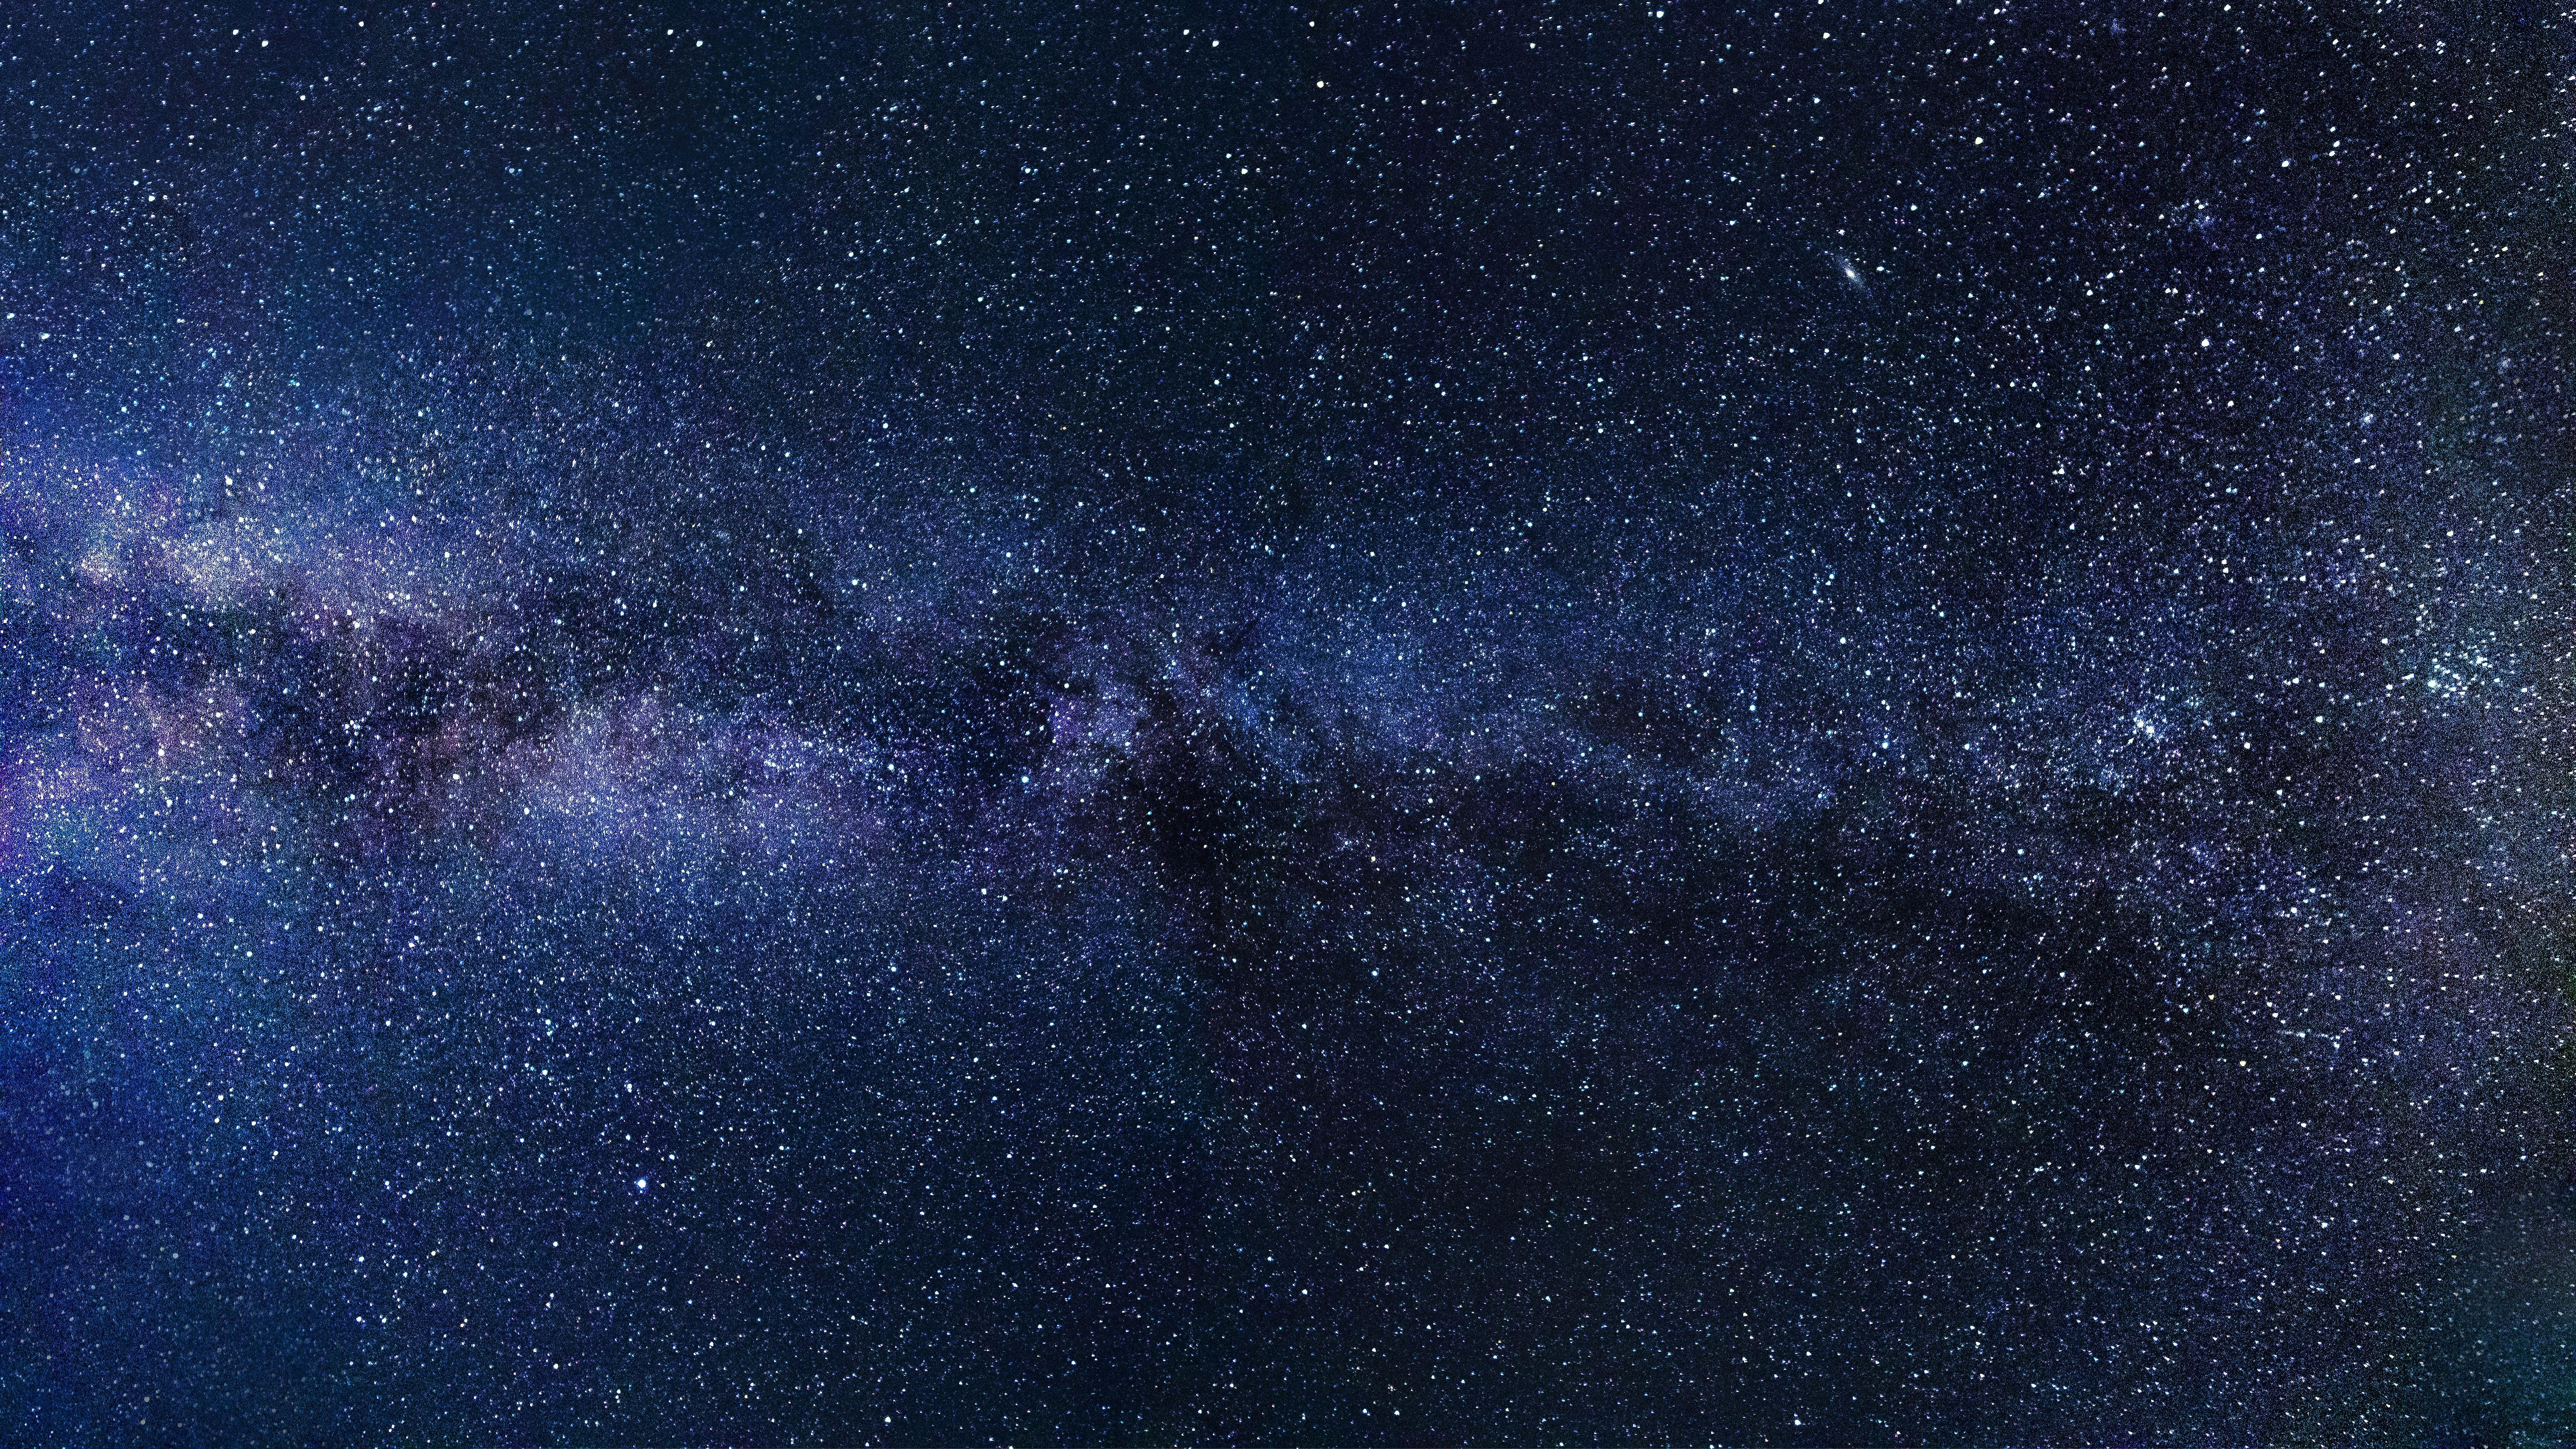 Milky way starry sky night 5k hd digital universe 4k for Night sky wallpaper 4k